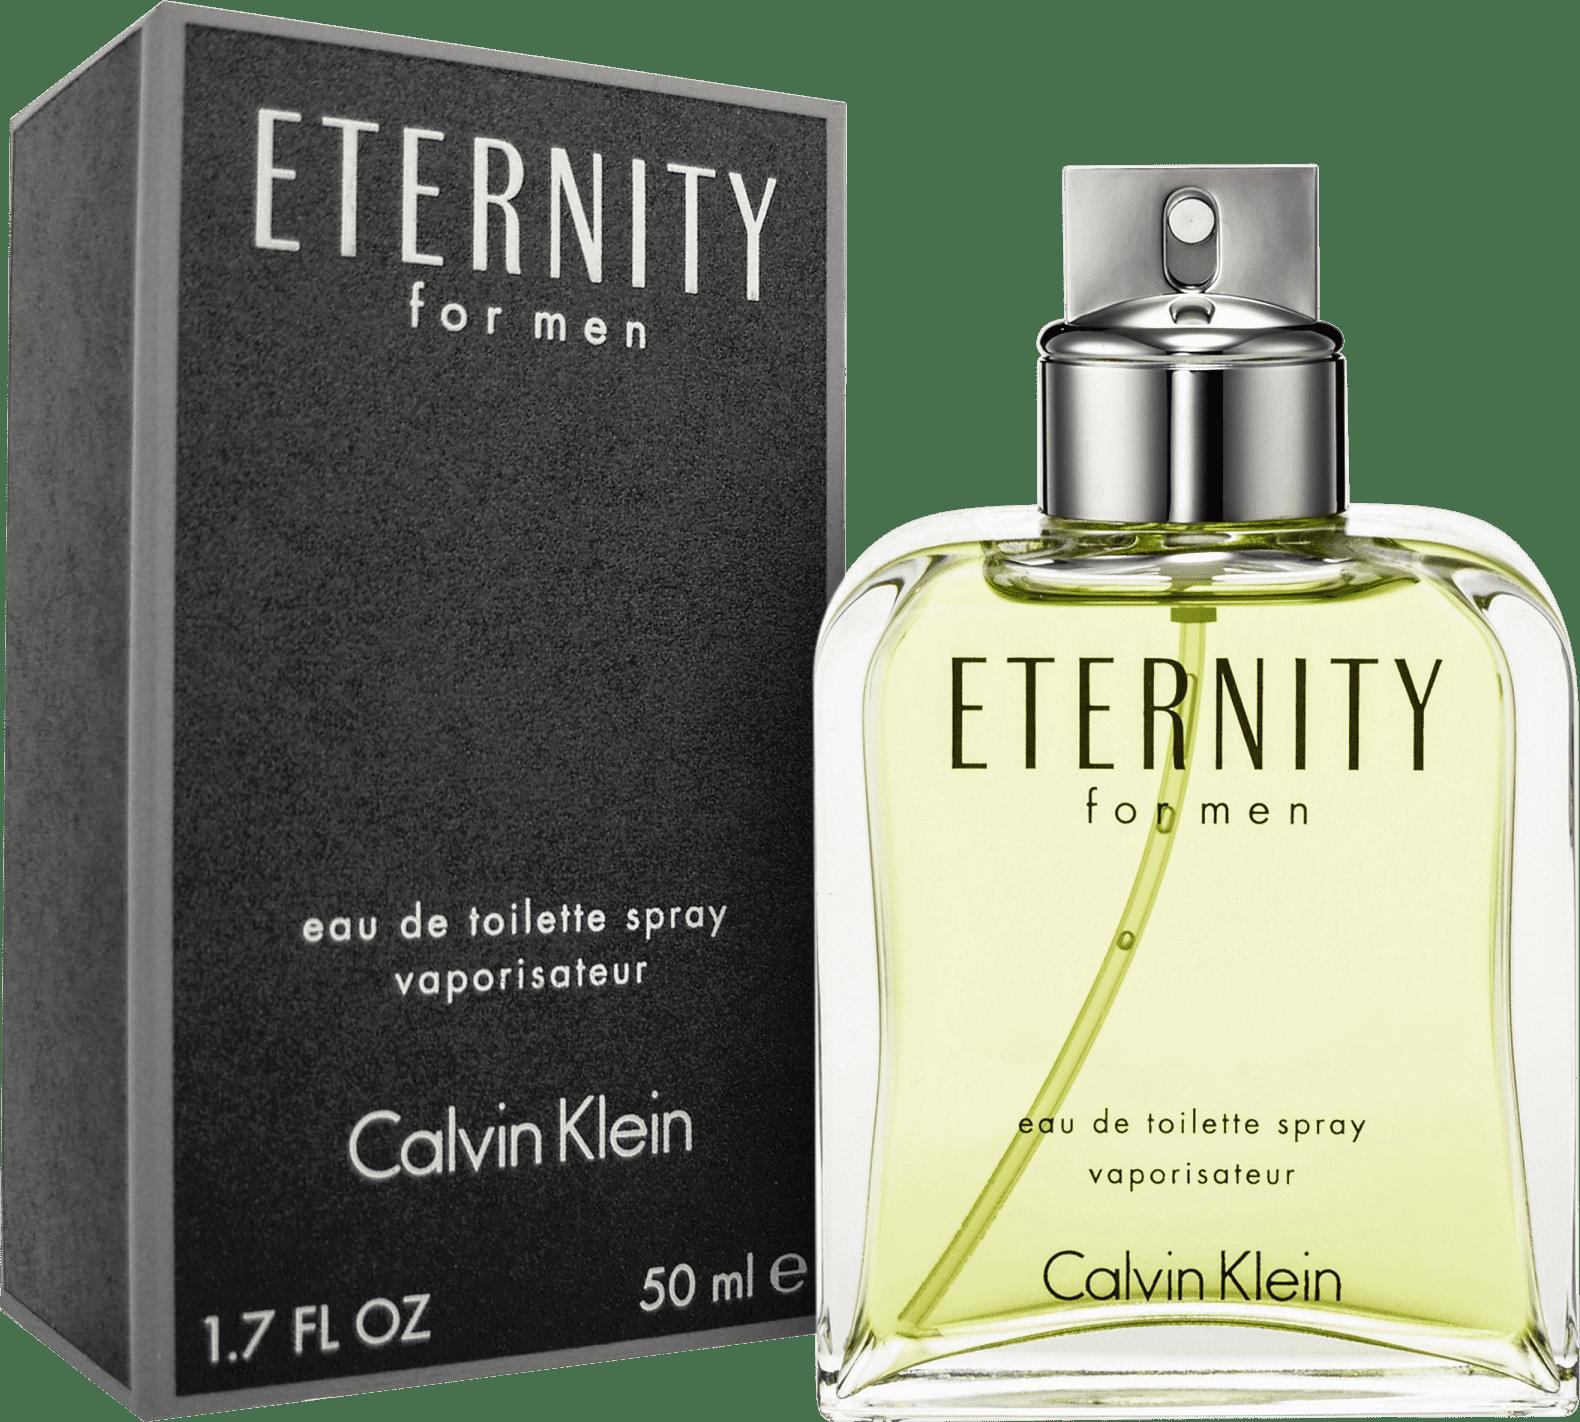 Eternity For Men Calvin Klein Eau de Toilette - Perfume Masculino 50ml 07f731490a